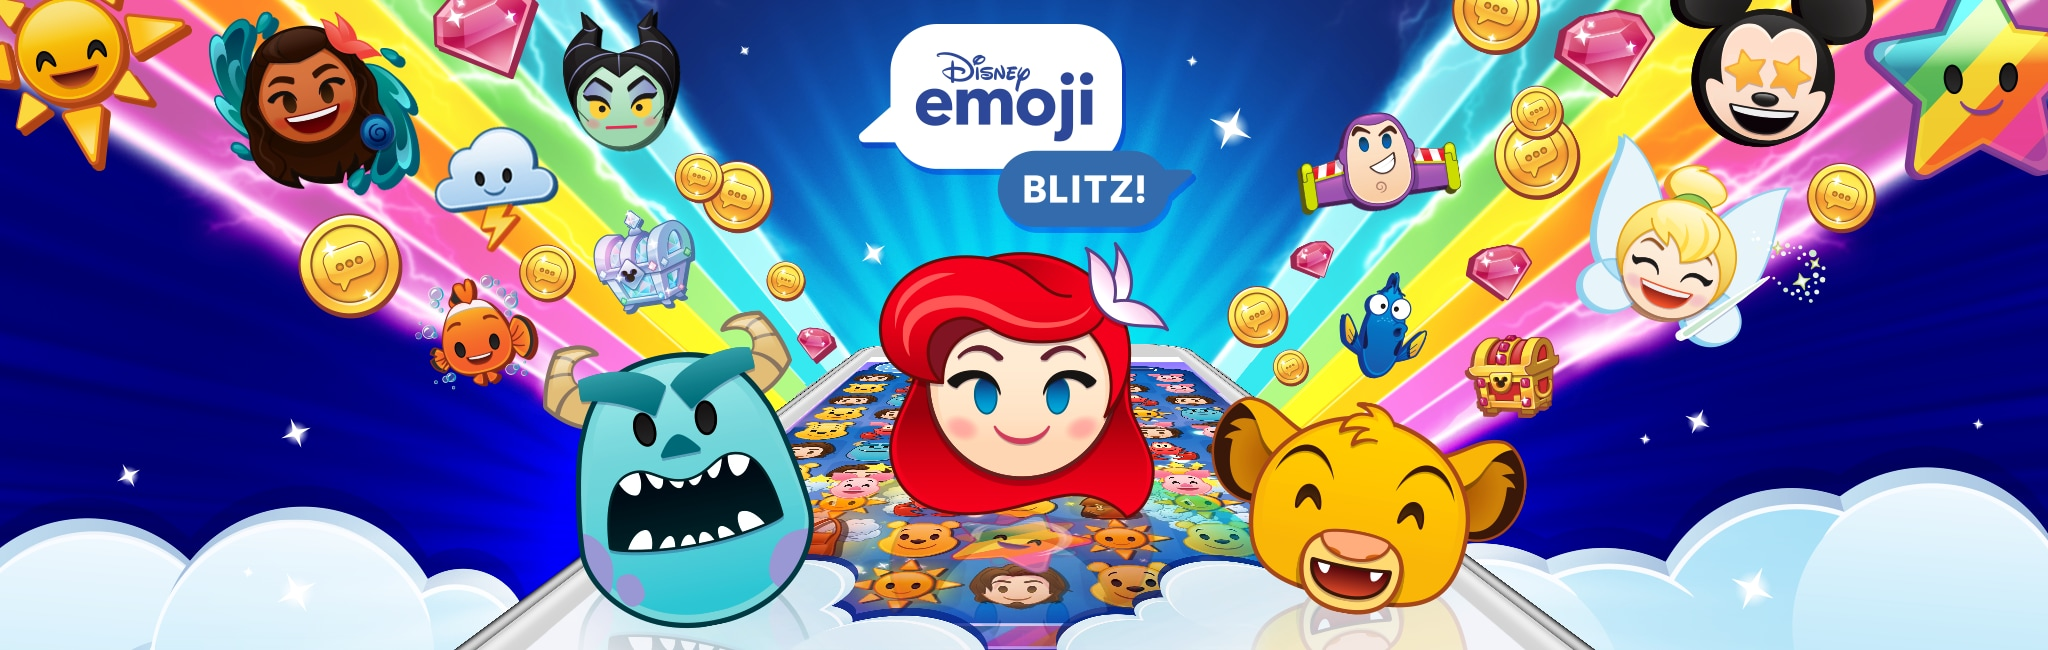 Emoji Blitz Disney Lol Games